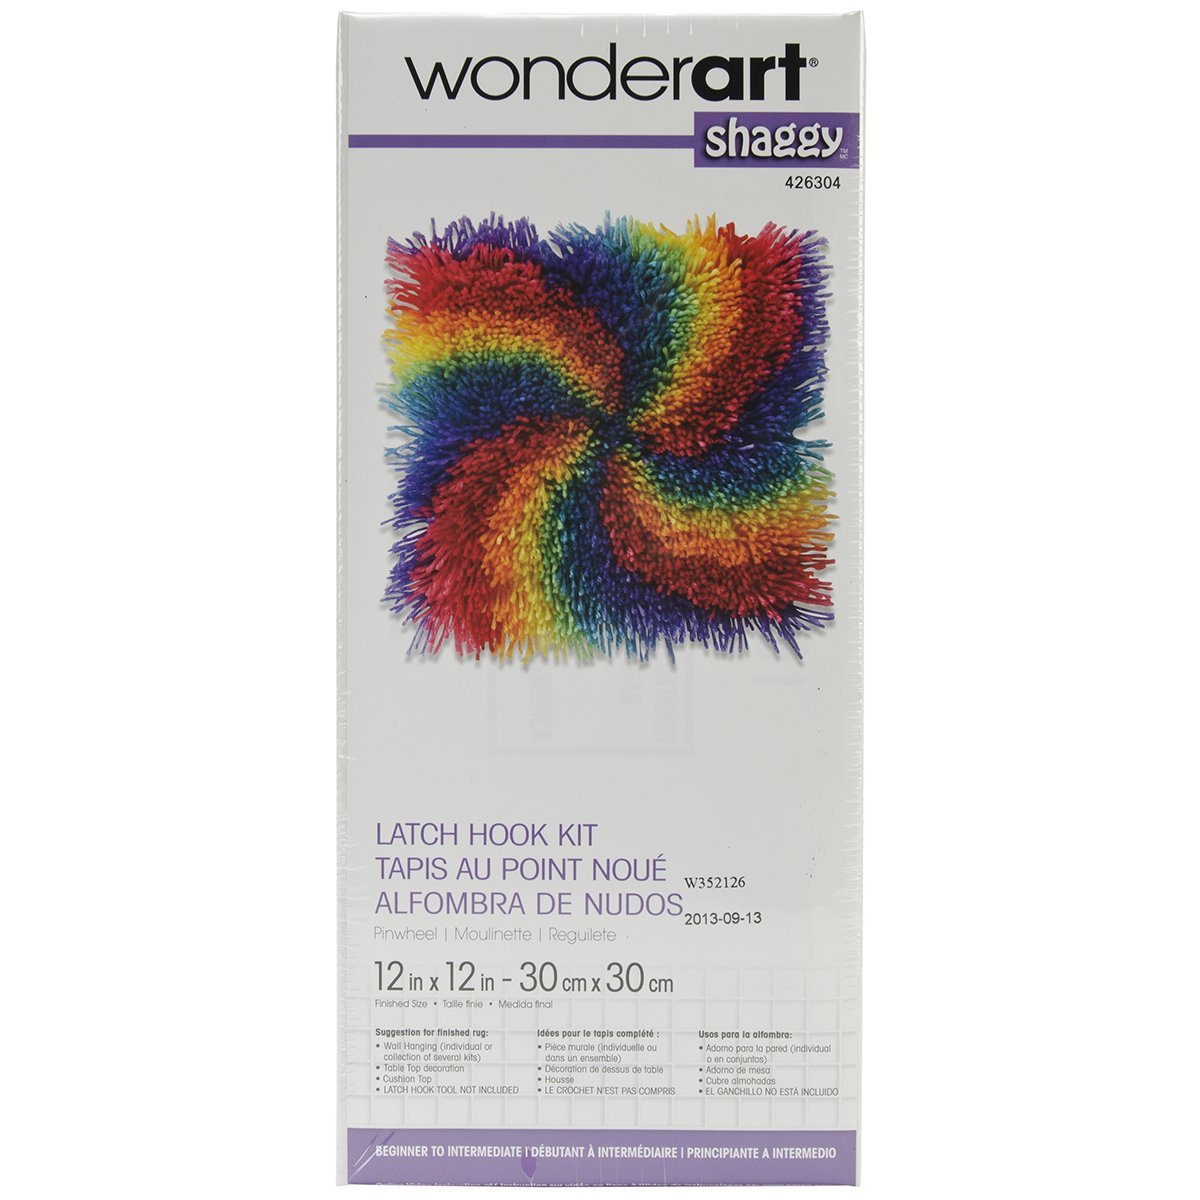 Wonderart Shaggy Flowers Latch Hook Kit, 12 X 12 12 X 12 Spinrite 426303